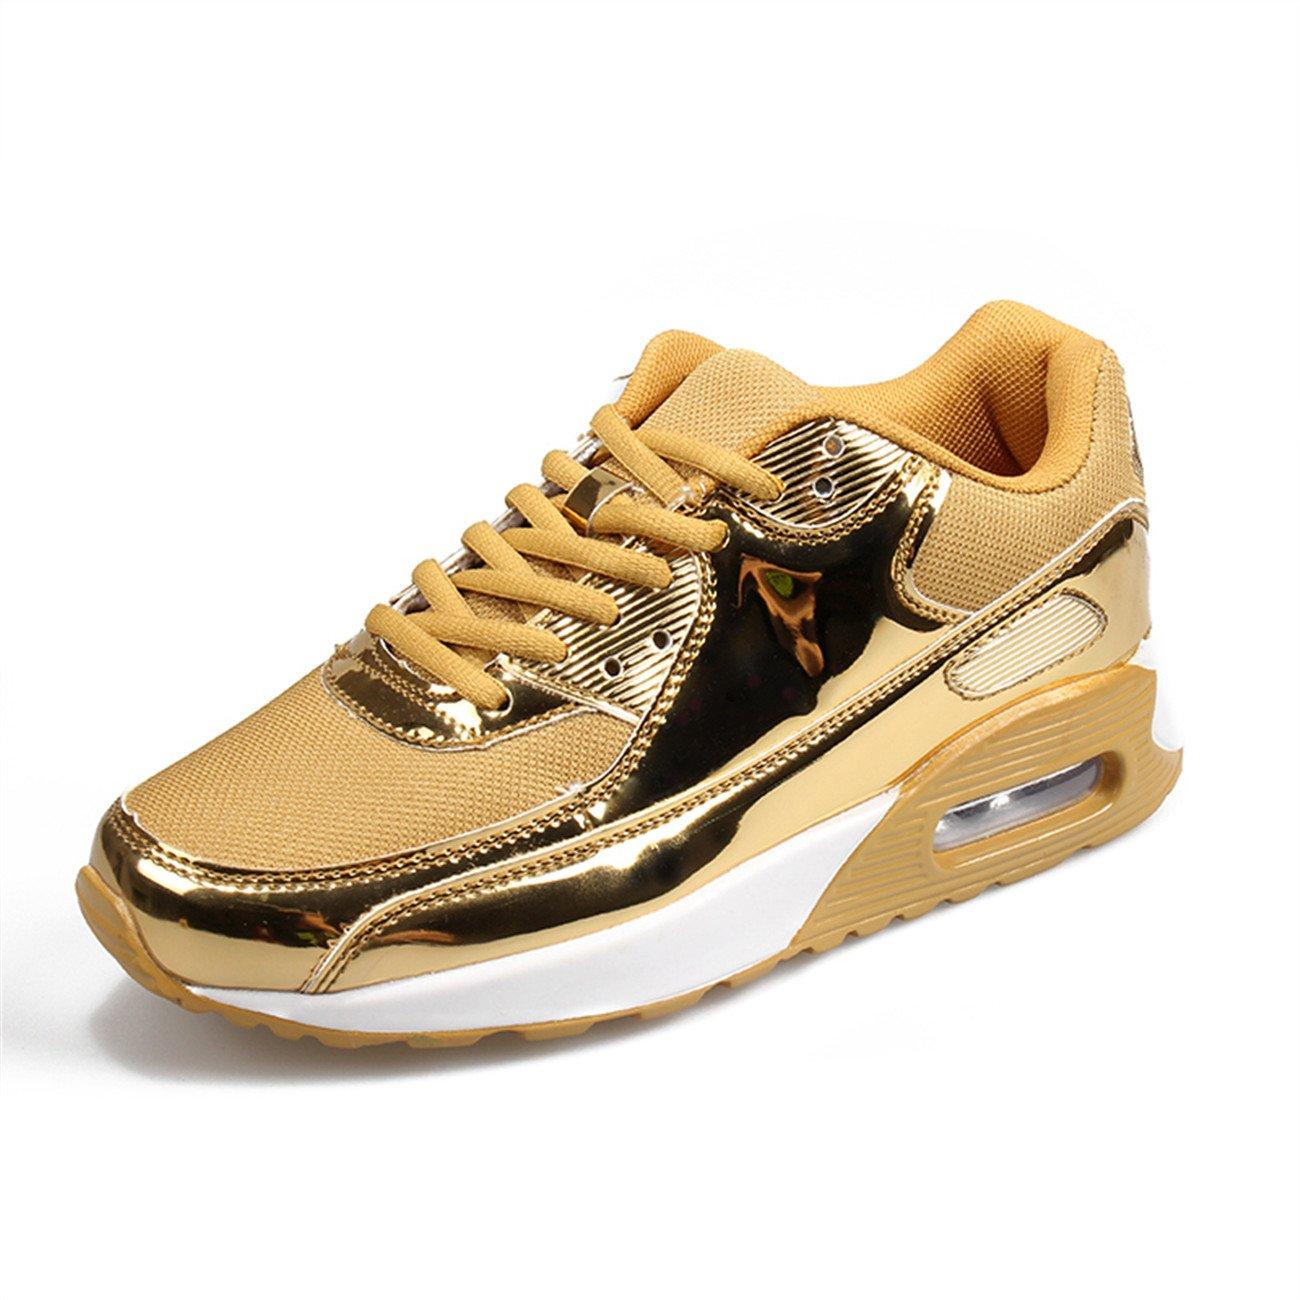 XINGLAN Men Women Unisex Couple Casual Running Sneakers Breathable Athletic Air Cushion Sports Shoes B073QVWJ45 Women 9.5 B(M) US / Men 8 D(M) US|Gold